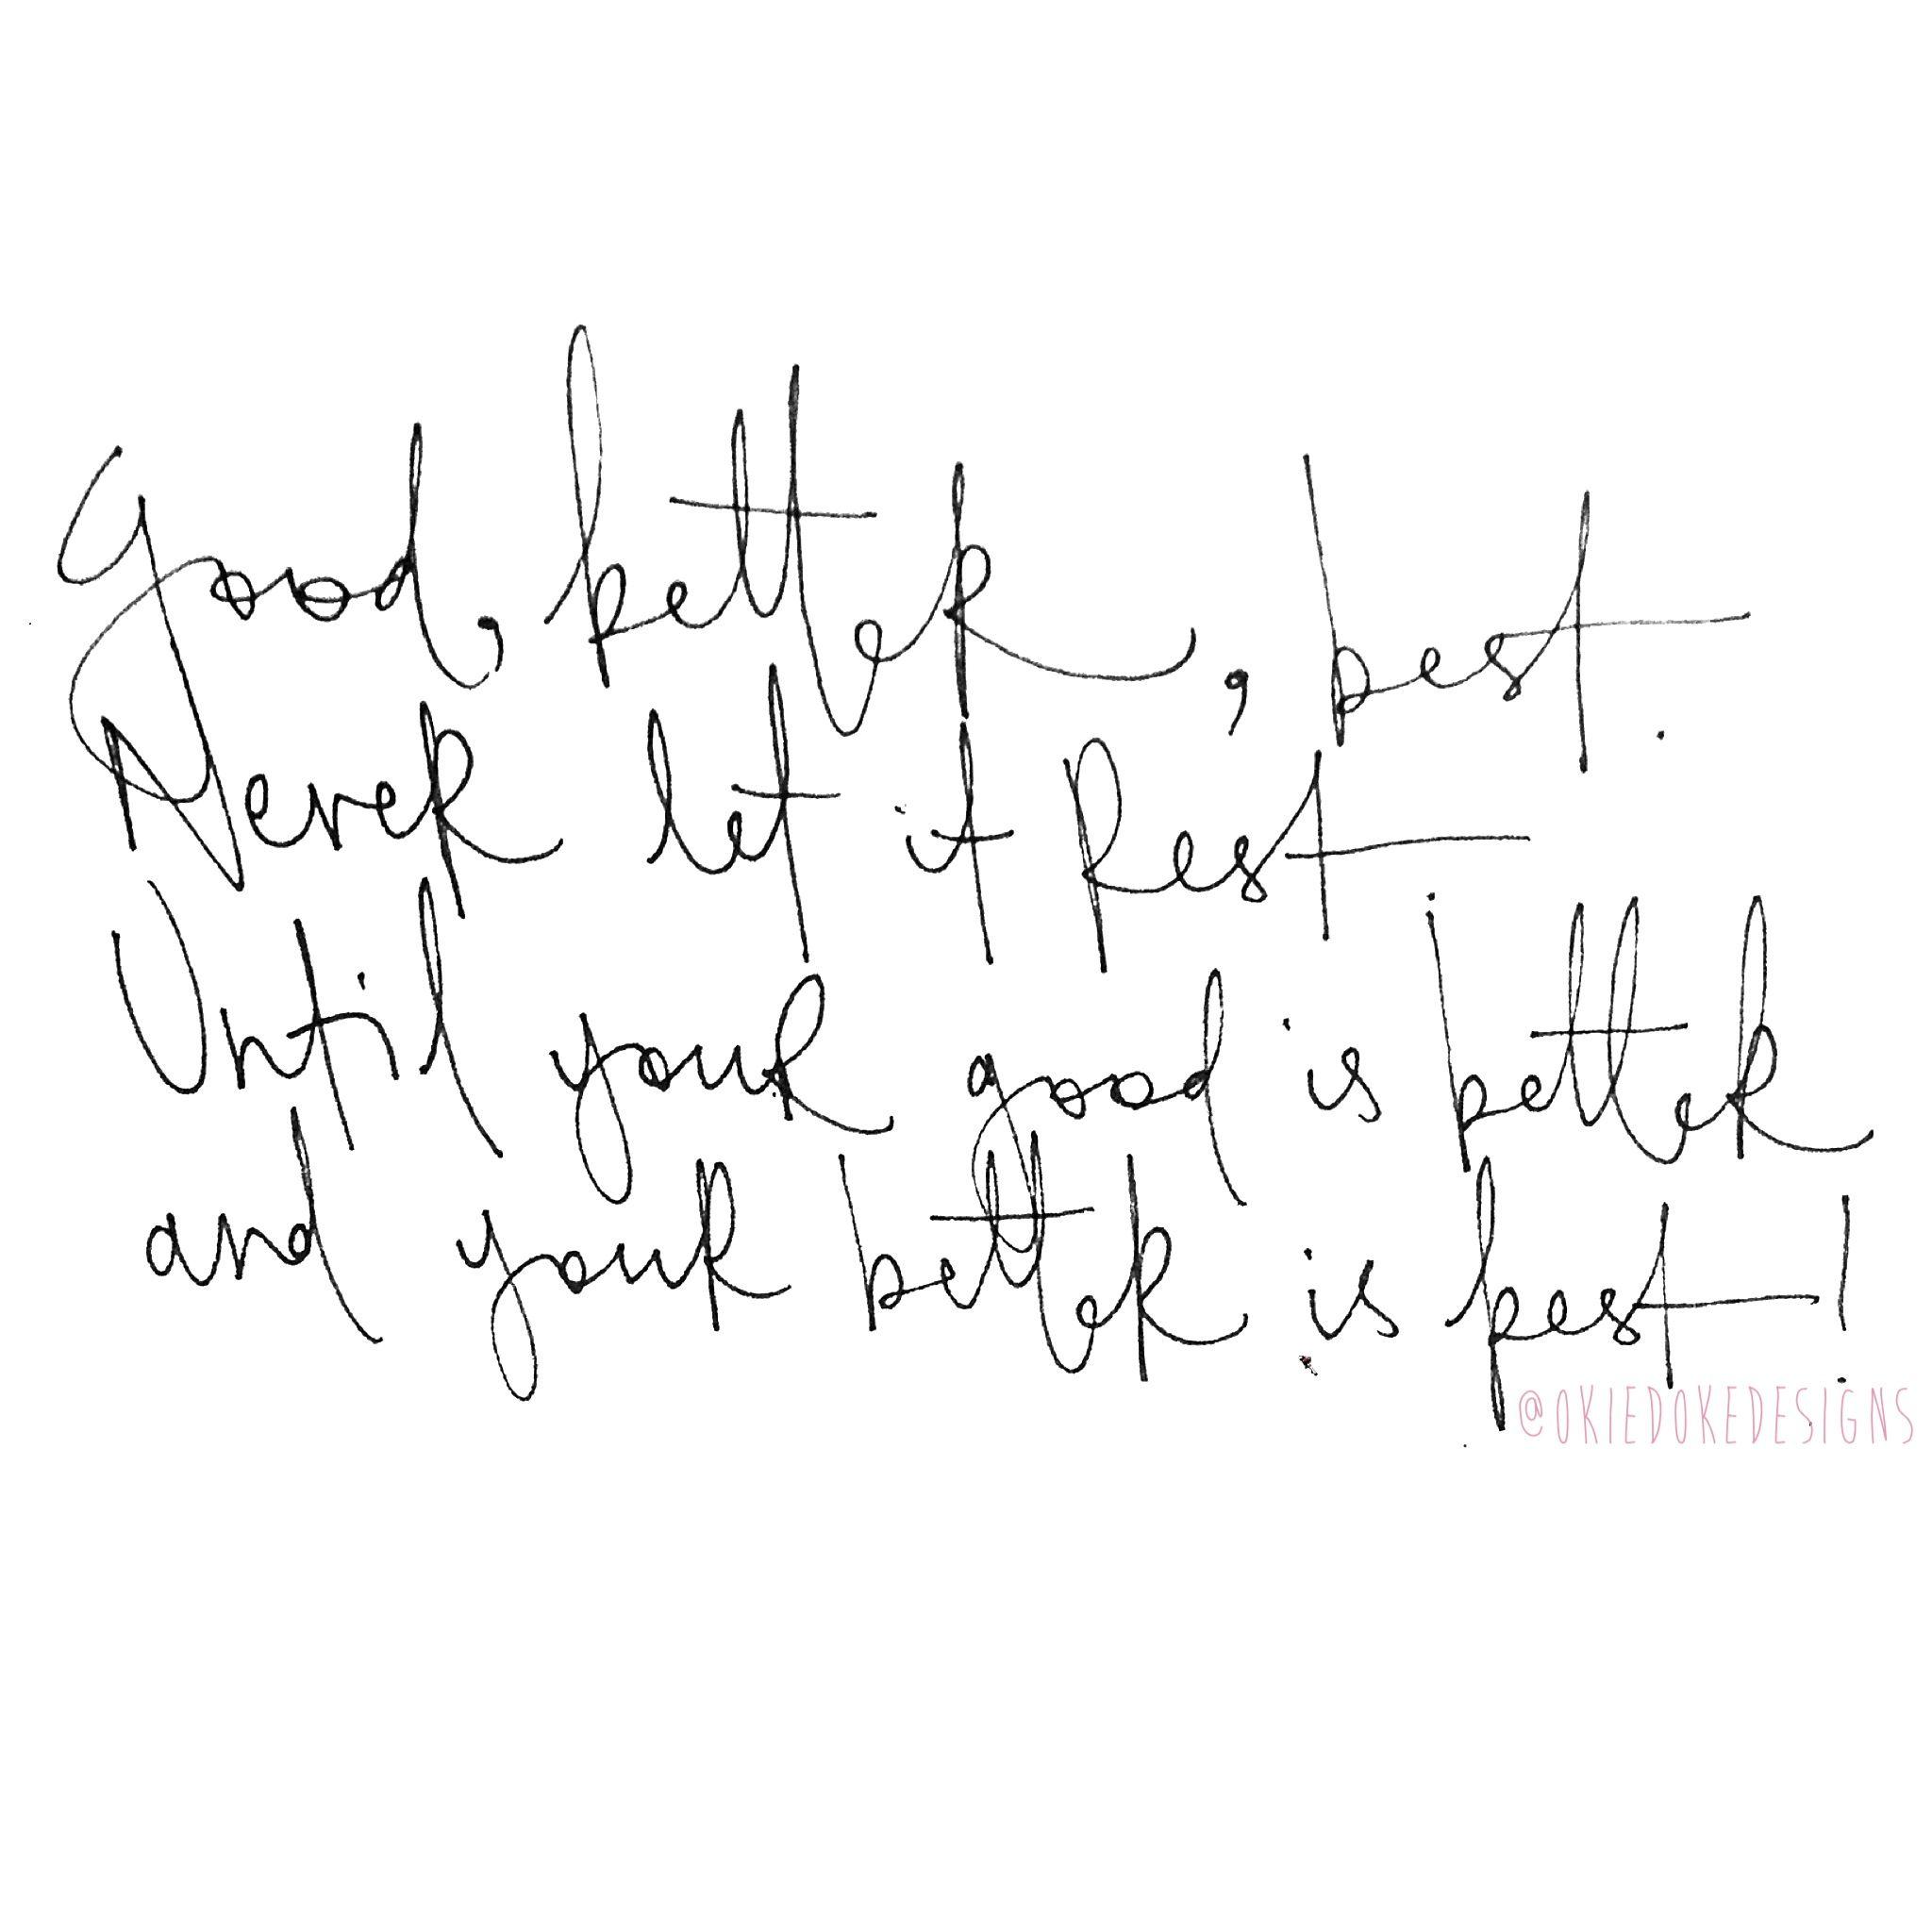 'Good, better, best. Never let it rest. Until your good is better and your better is best!' ♡ @okiedokedesigns info.okiedoke@gmail.com Instagram: okiedokedesigns #handwritten #good #better #best #quote #love #happy #love #typography #pen #ink #paper #font #writing